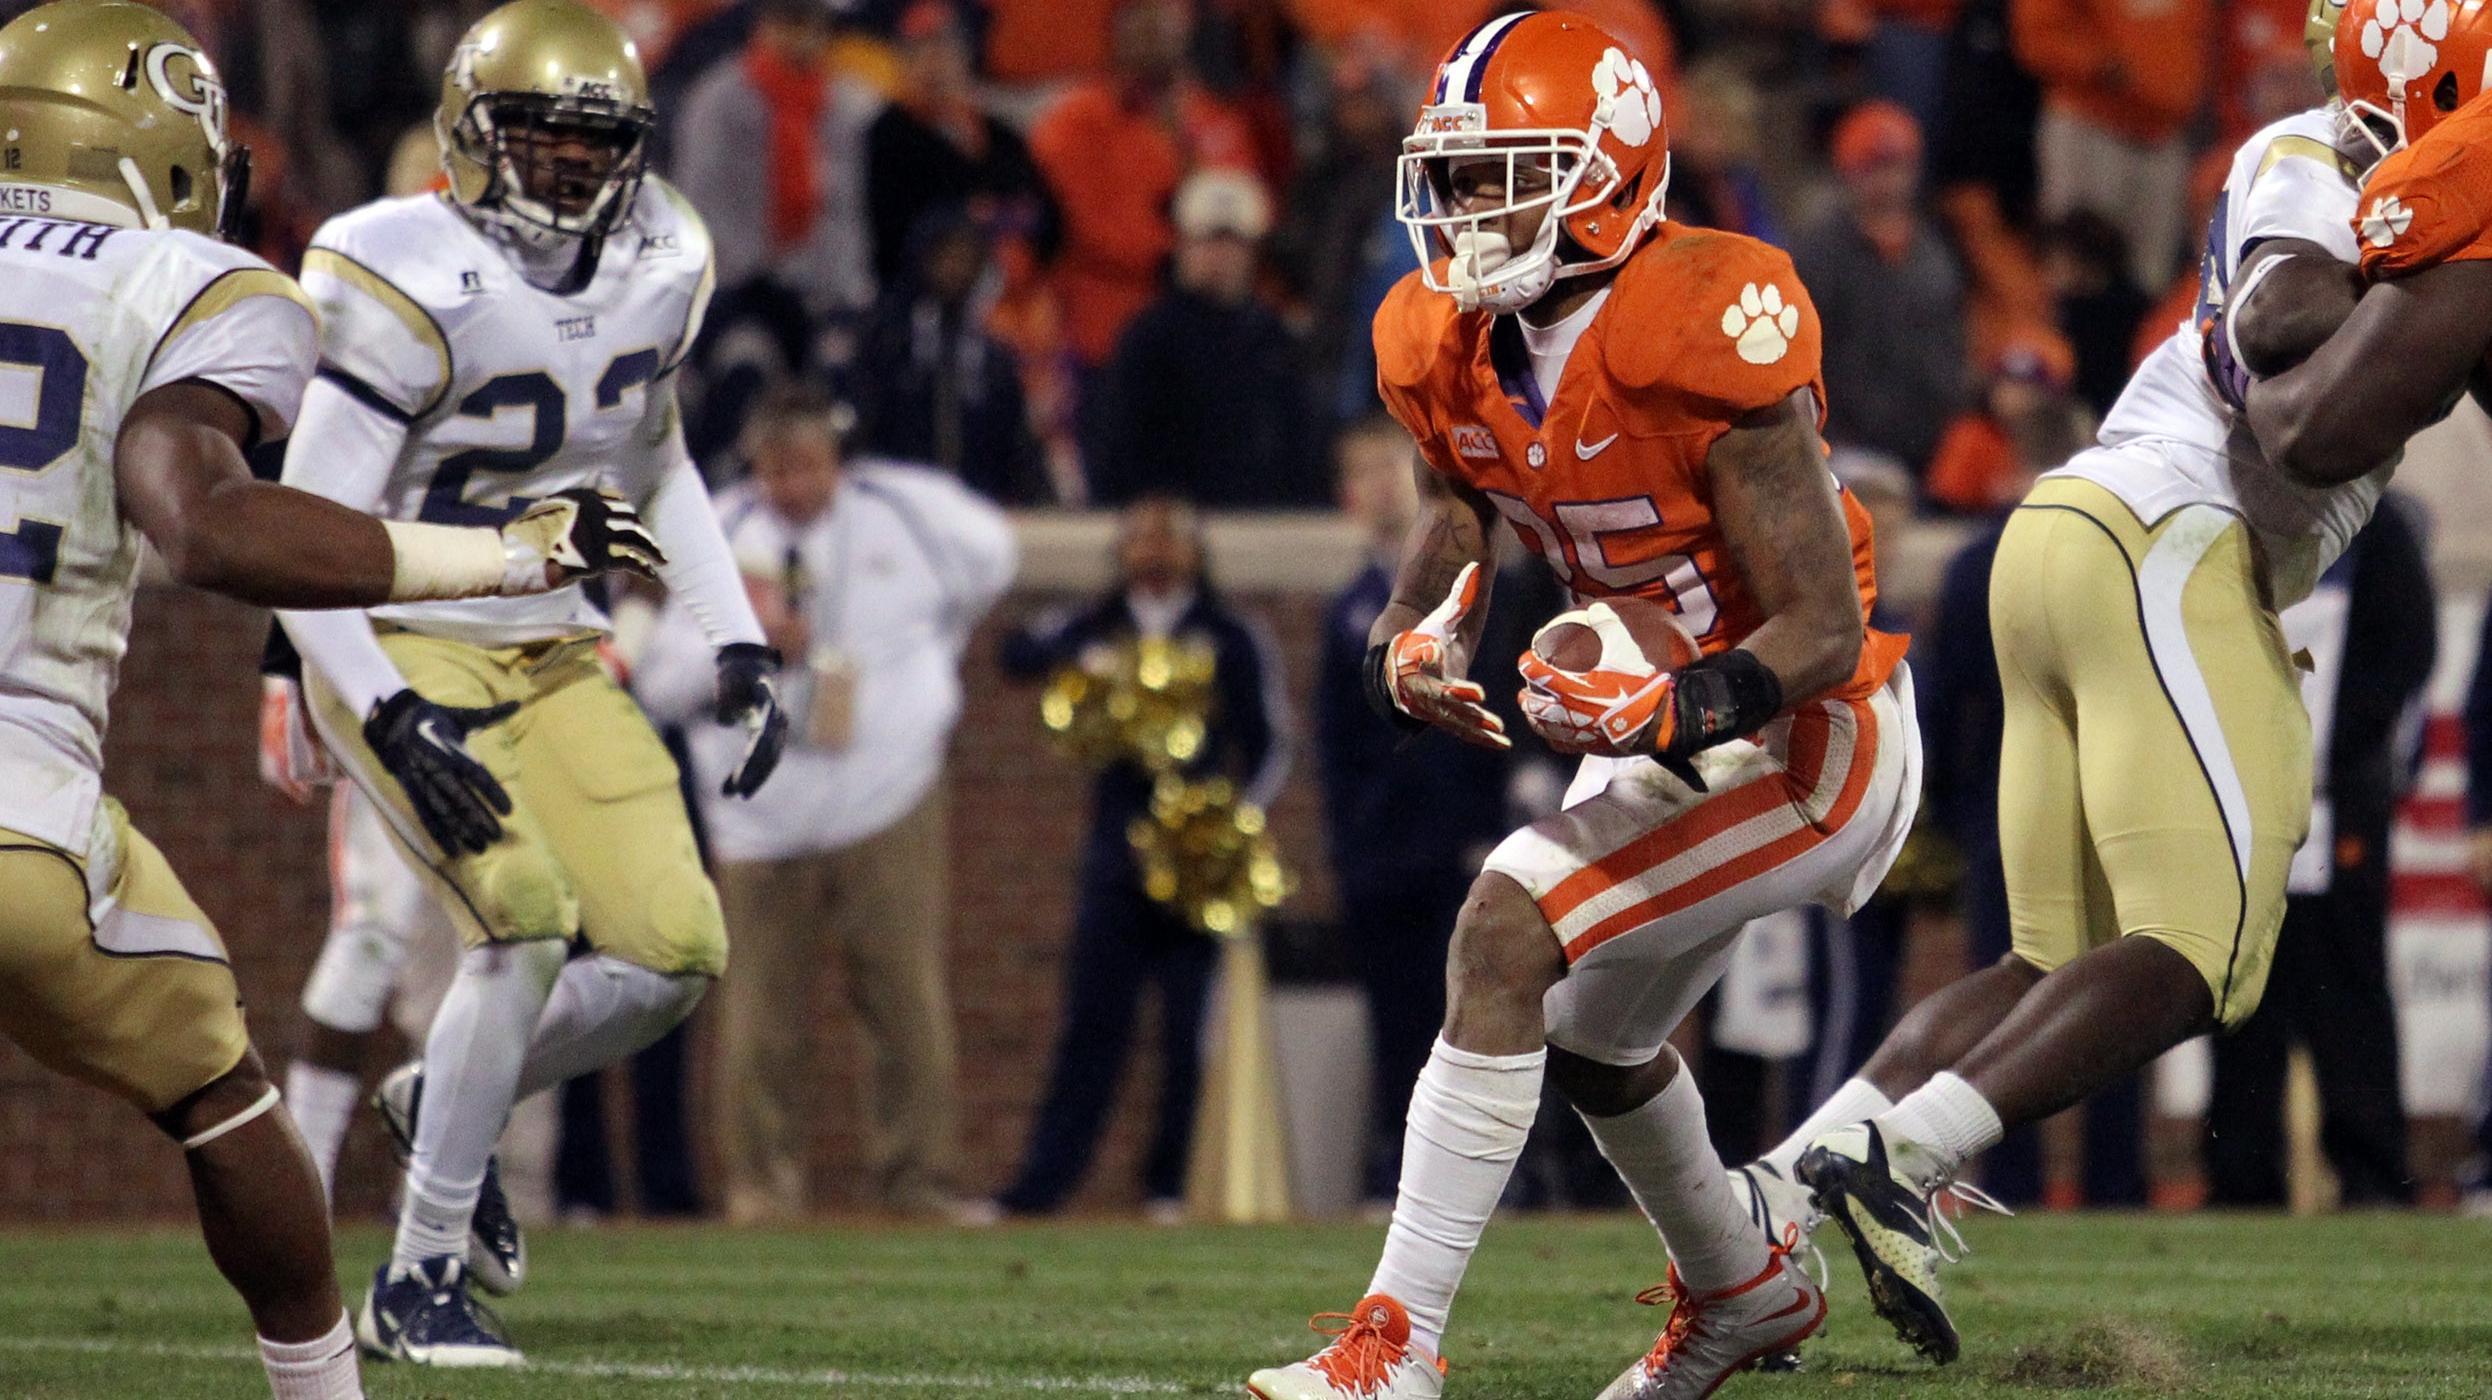 Clemson at South Carolina Football Game to Kick Off at 7 PM on Nov. 30